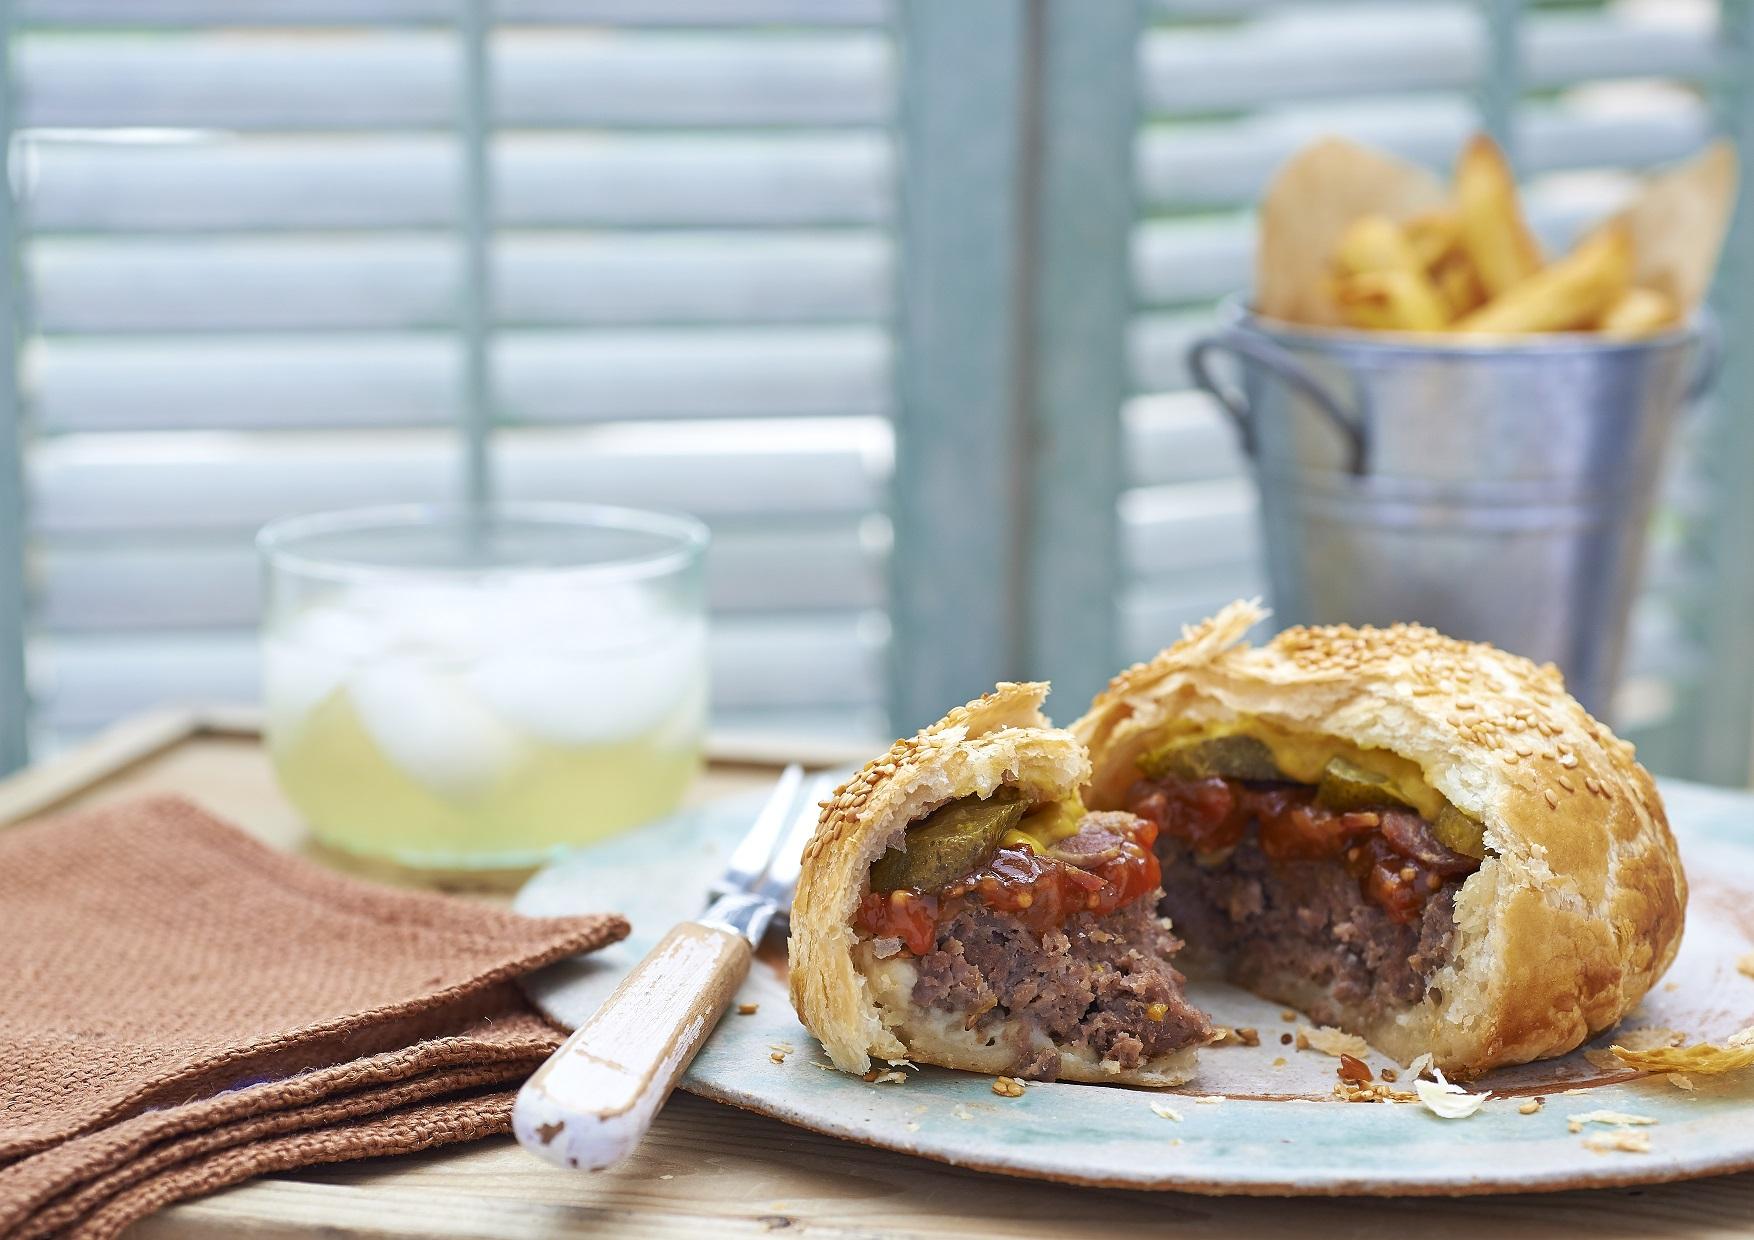 British pie week recipe: Here's how to make a pieburger